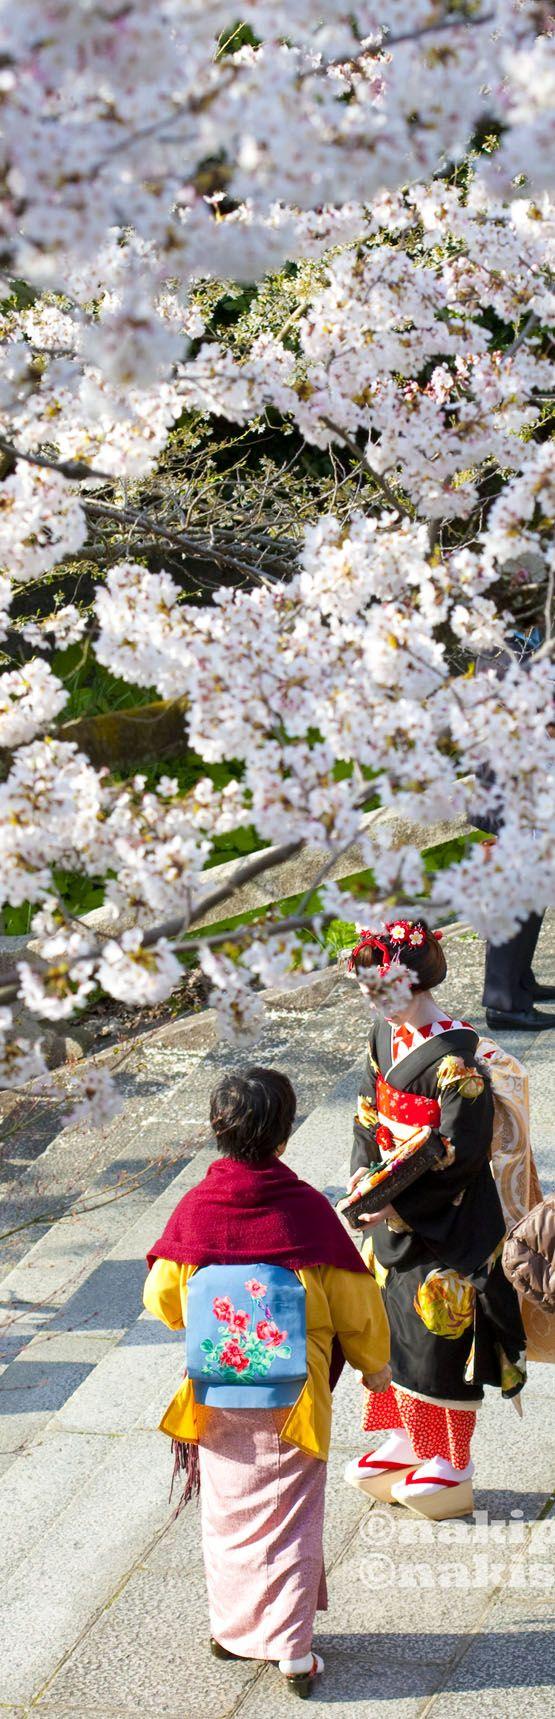 Japan Cherry blossoms: Photo by NAKISURF: Blossoms Sakura, Japan Cherries Blossoms, Cherries Trees, Japanese Cherries Blossoms, Beautiful Pictures, Japan Gardens, Kyoto Japan, Sakura Trees Japan Cherries, Japan Travel